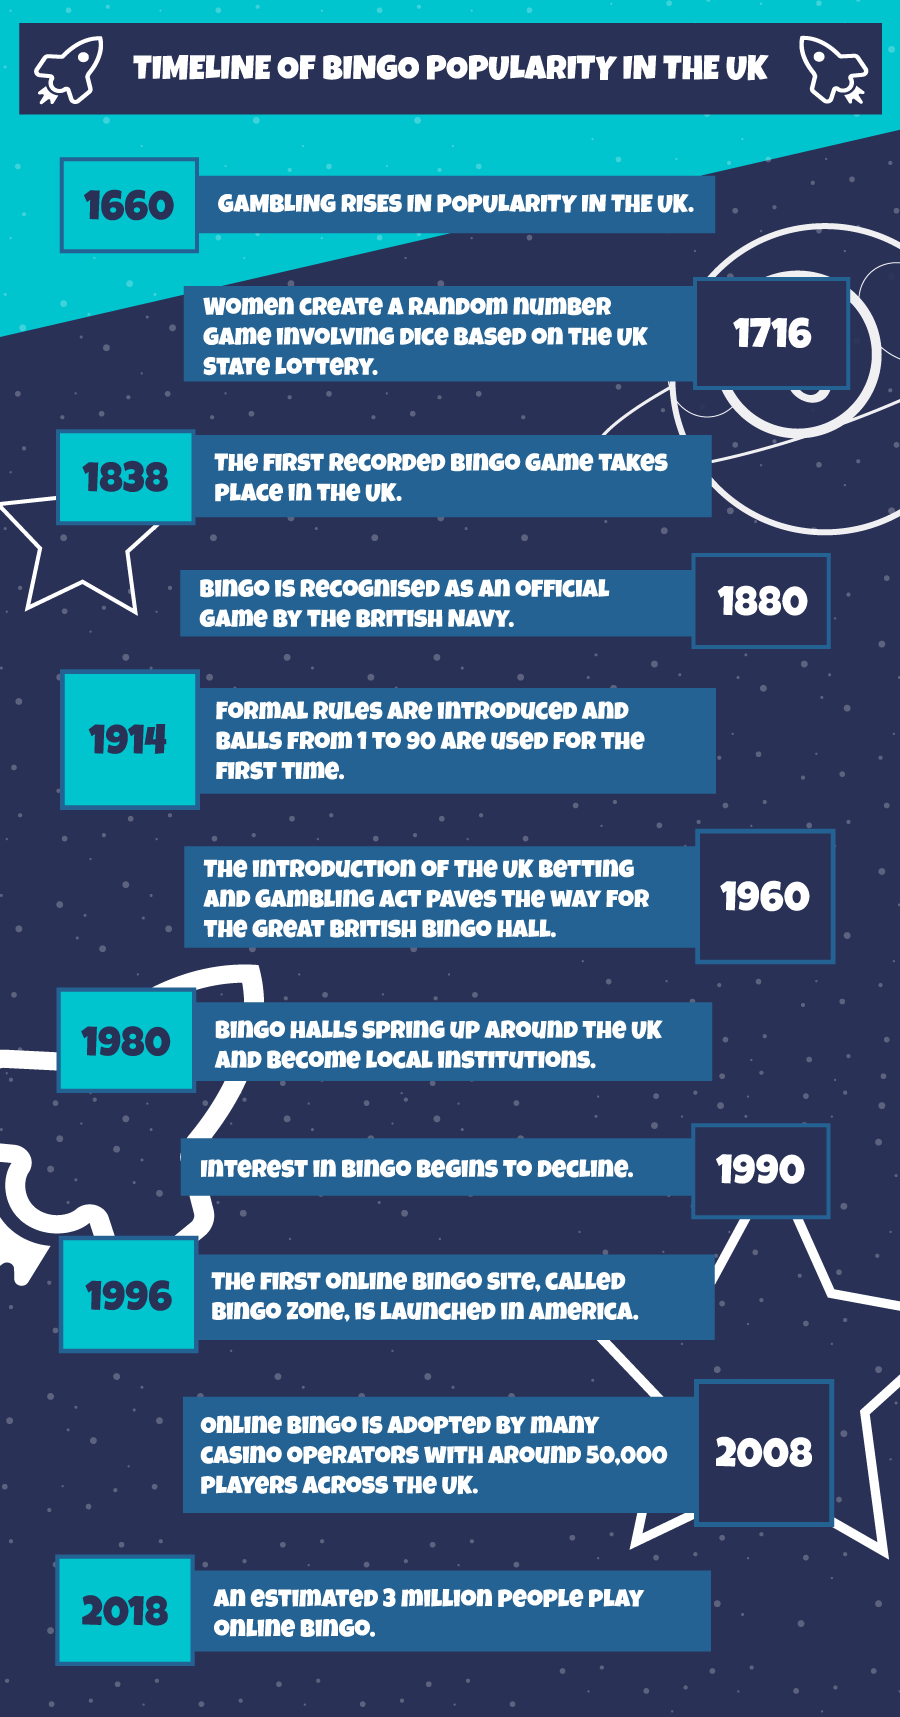 Bingo Popularity timeline